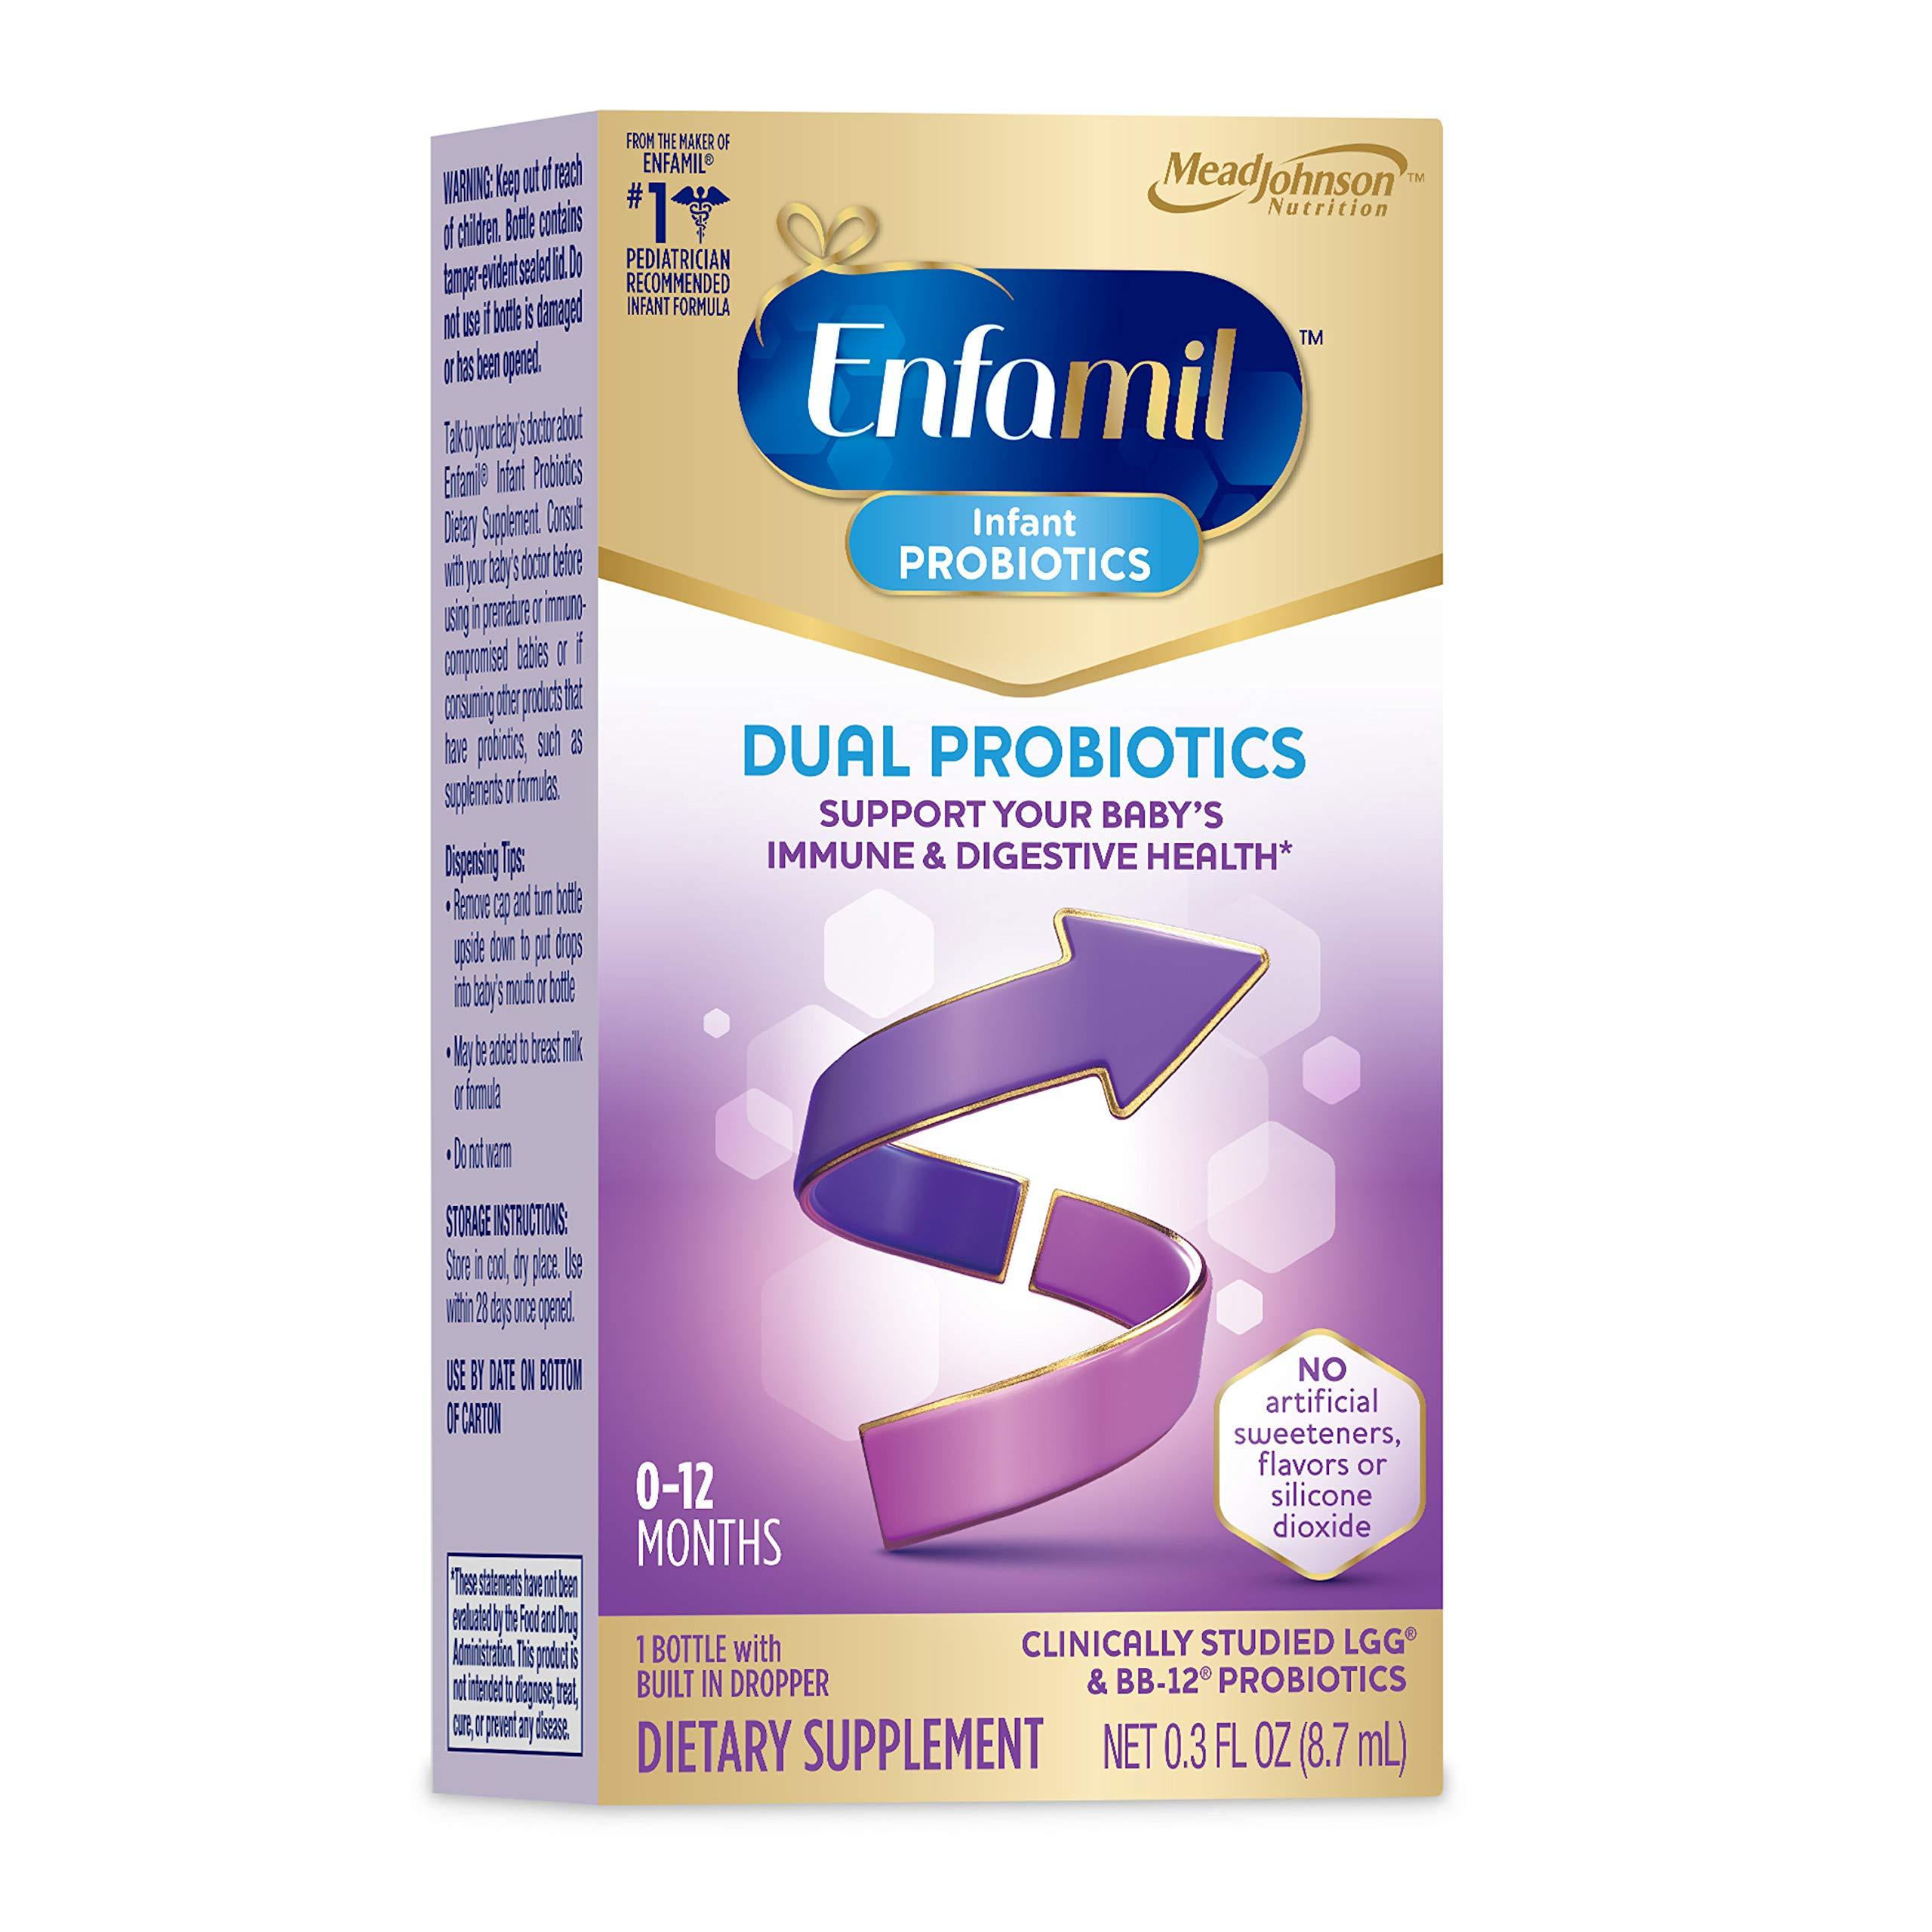 Enfamil Infant Probiotics Dual Probiotics, 8.7mL